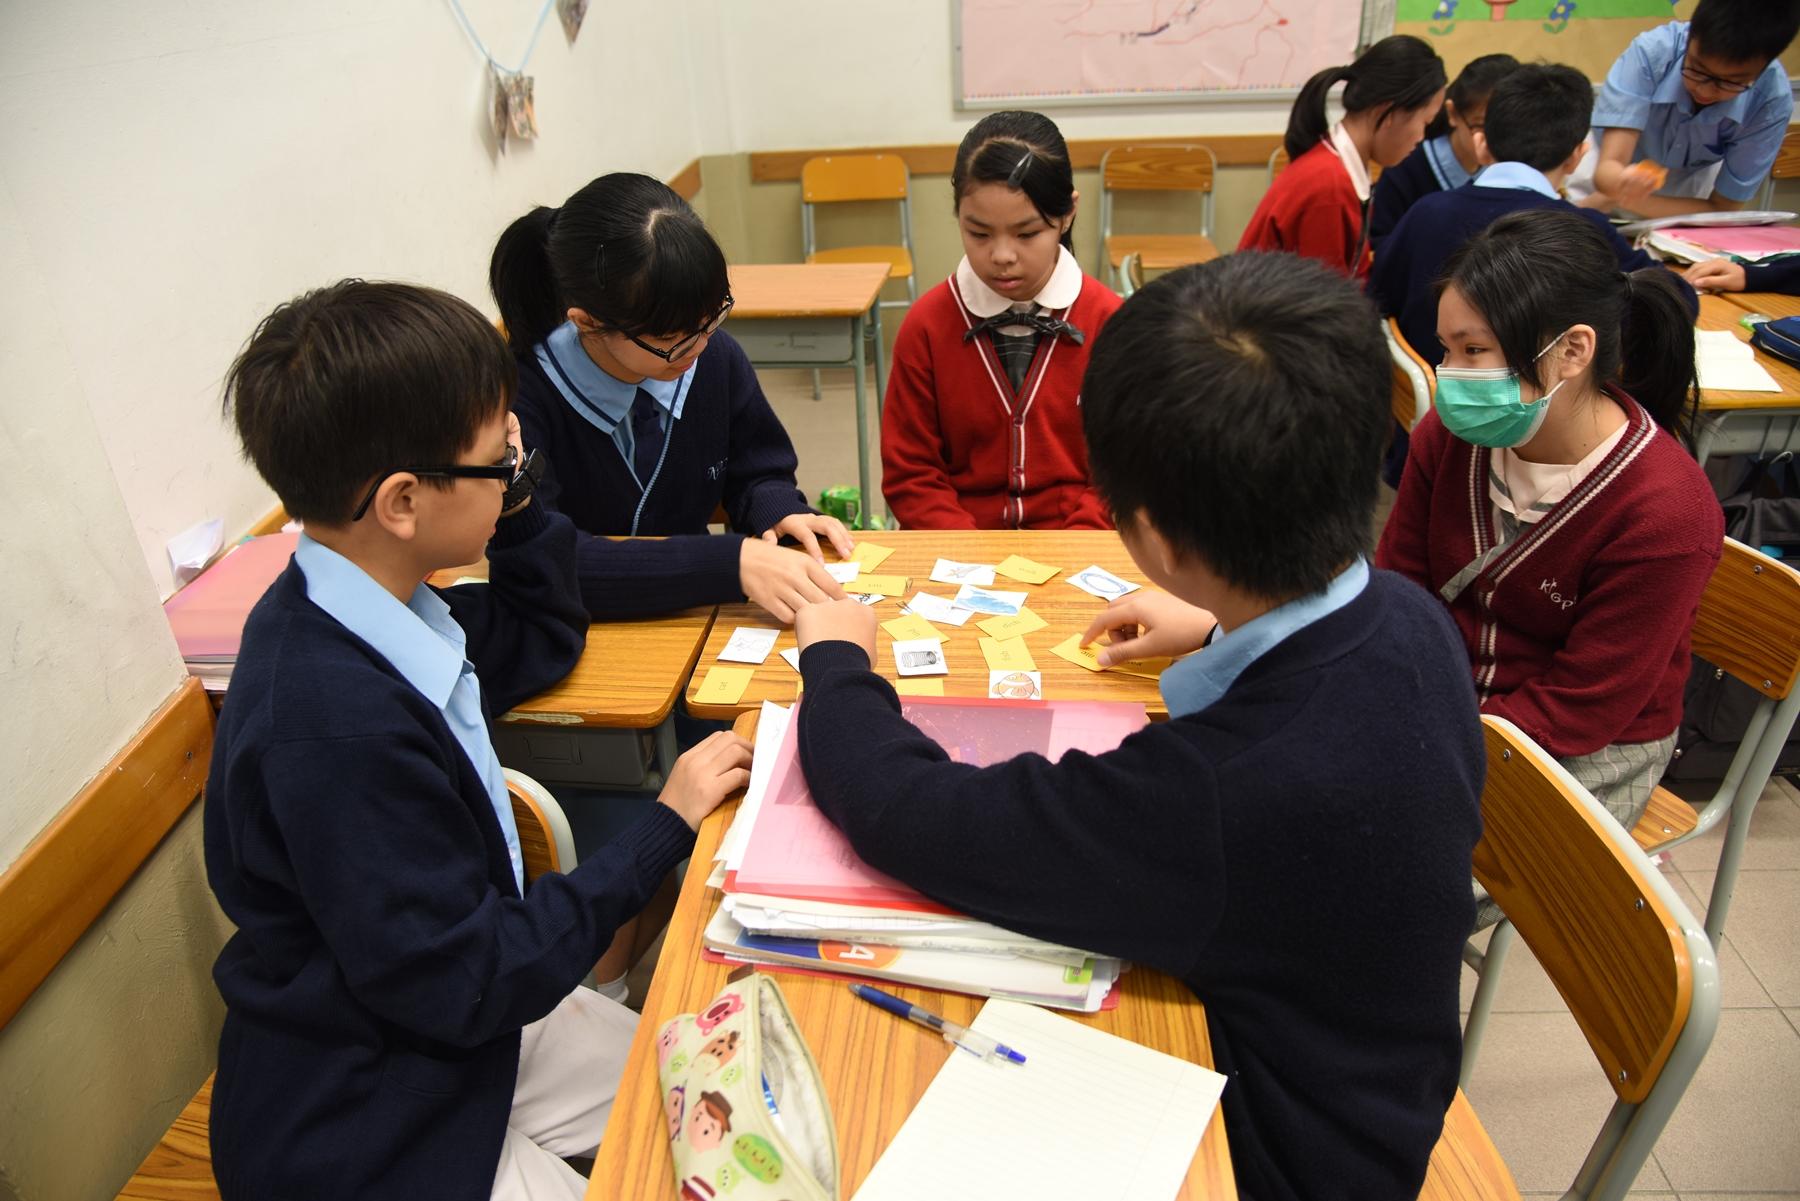 http://npc.edu.hk/sites/default/files/dsc_4999.jpg